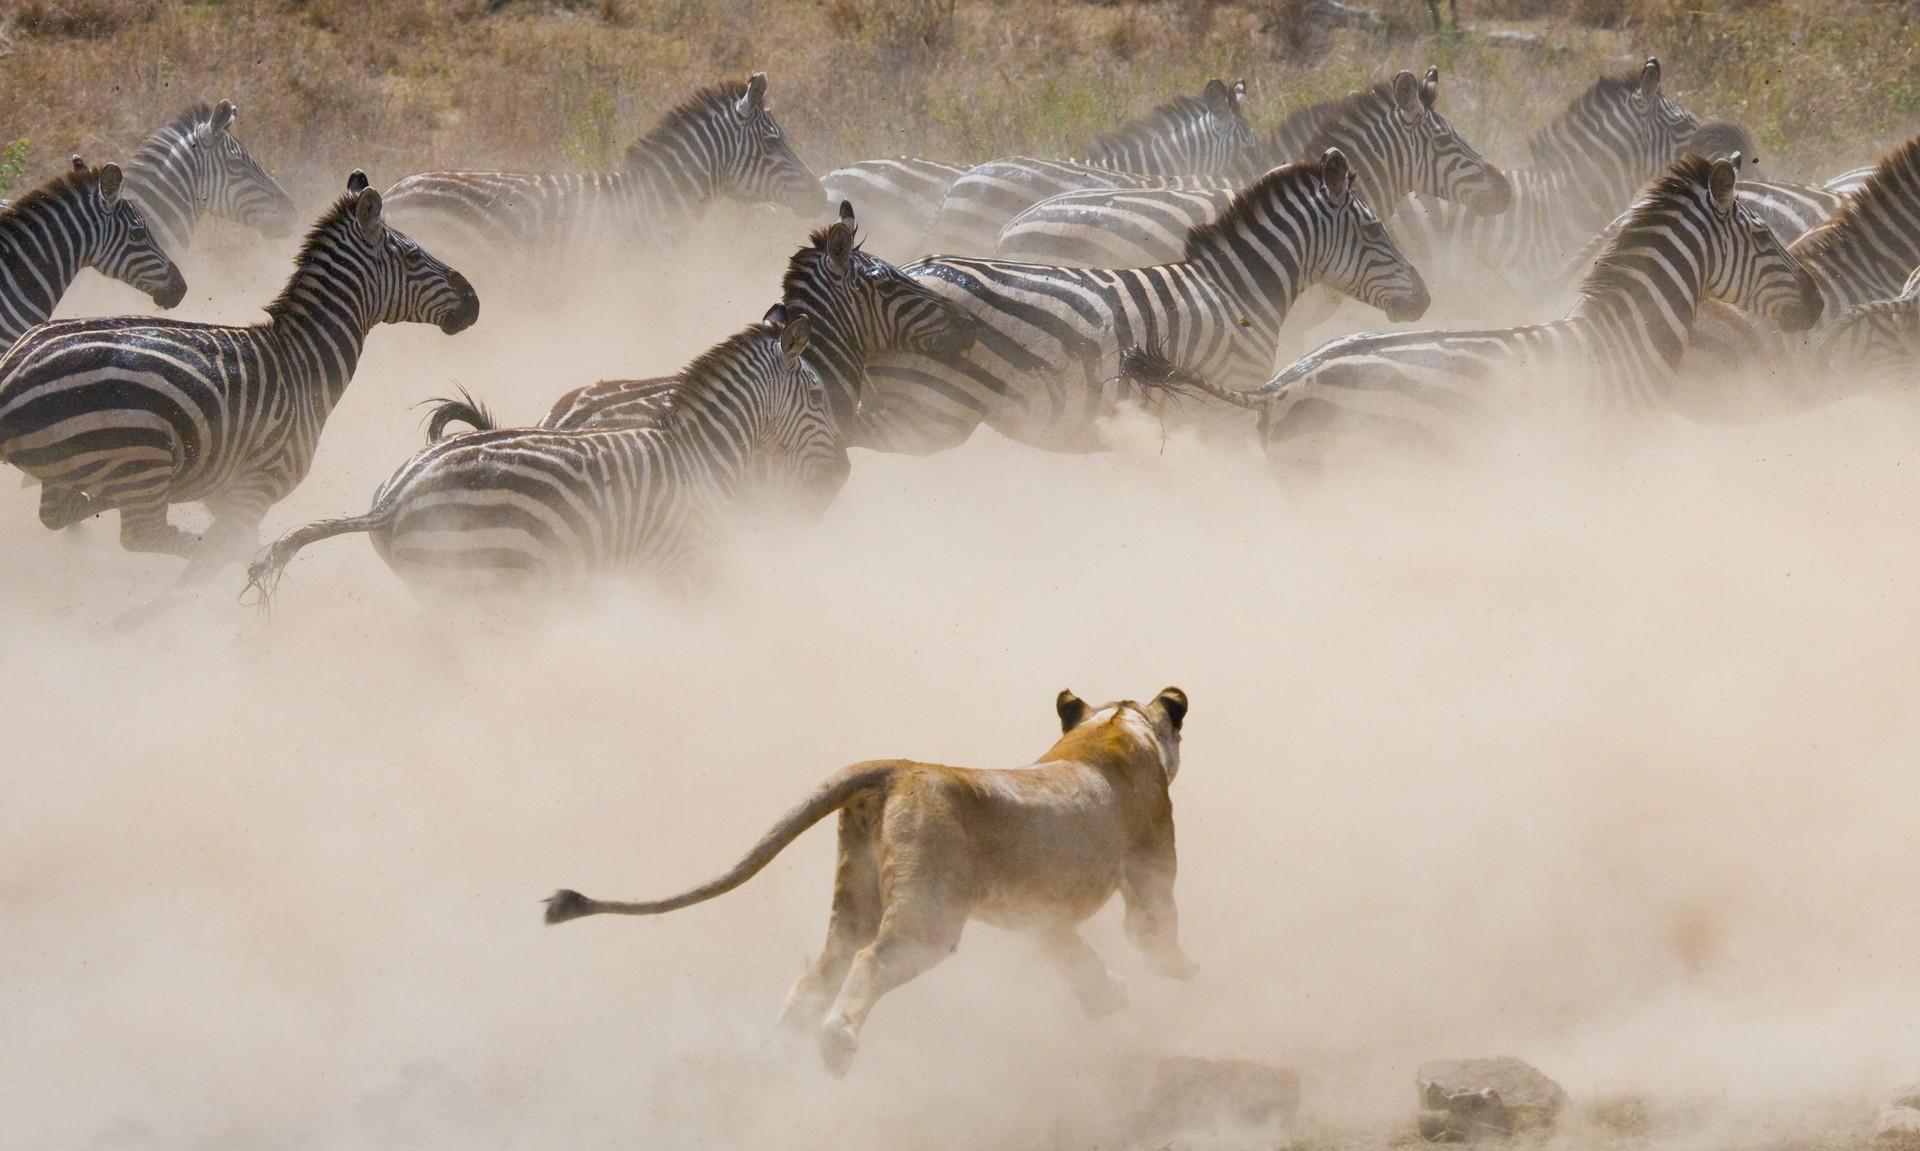 Lioness chasing zebra herd